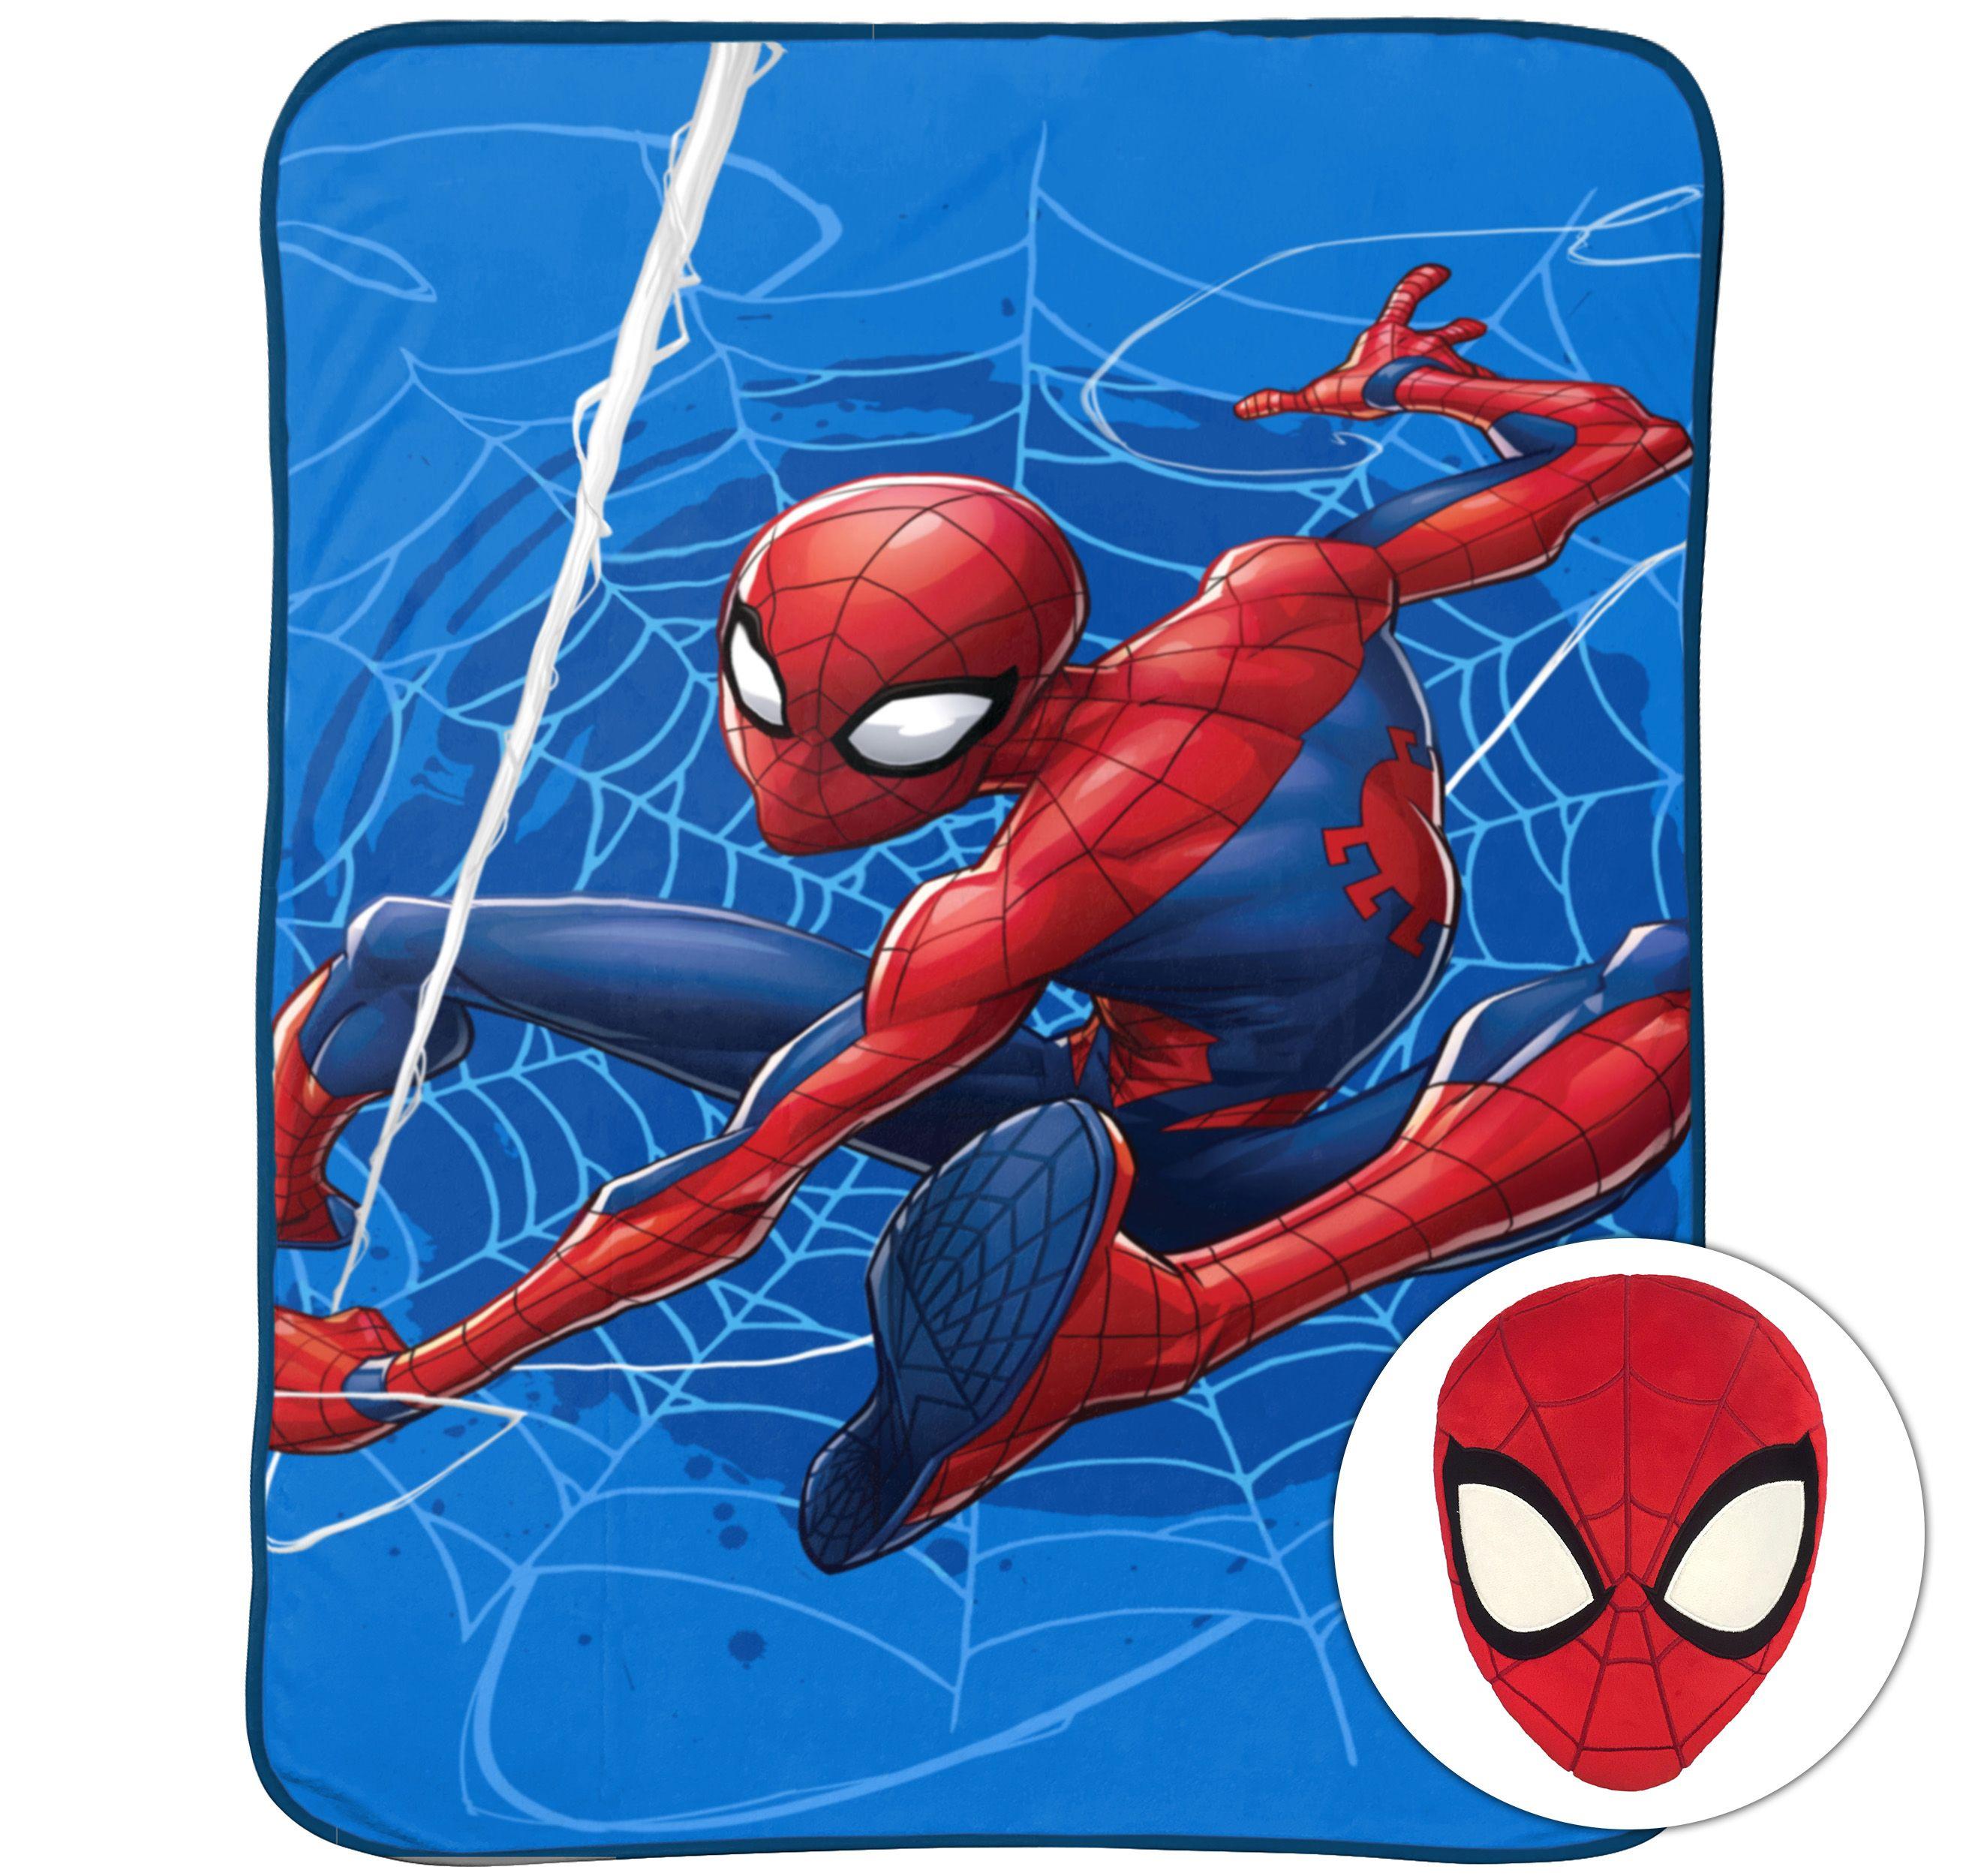 marvel spiderman noggin kid s bedding pillow and blanket set 1 each